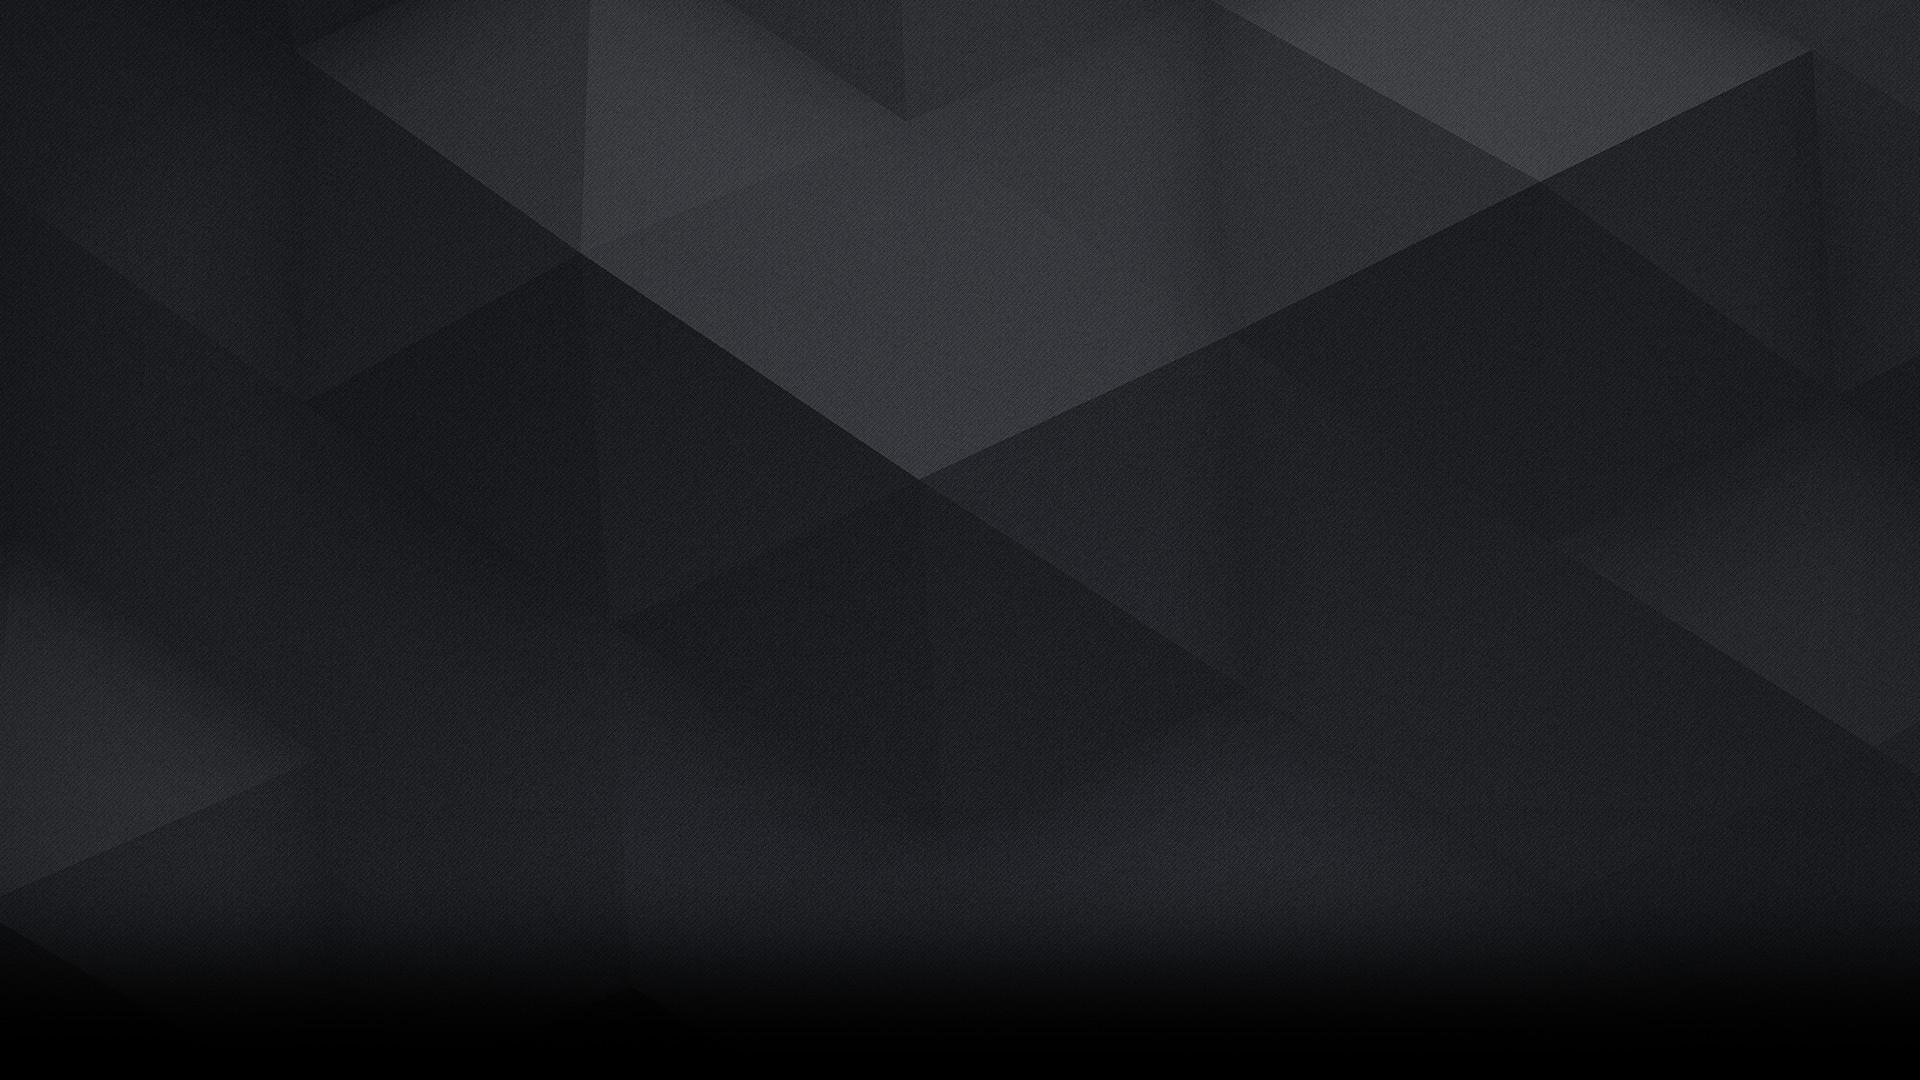 Black Vector Wallpaper At Getdrawingscom Free For